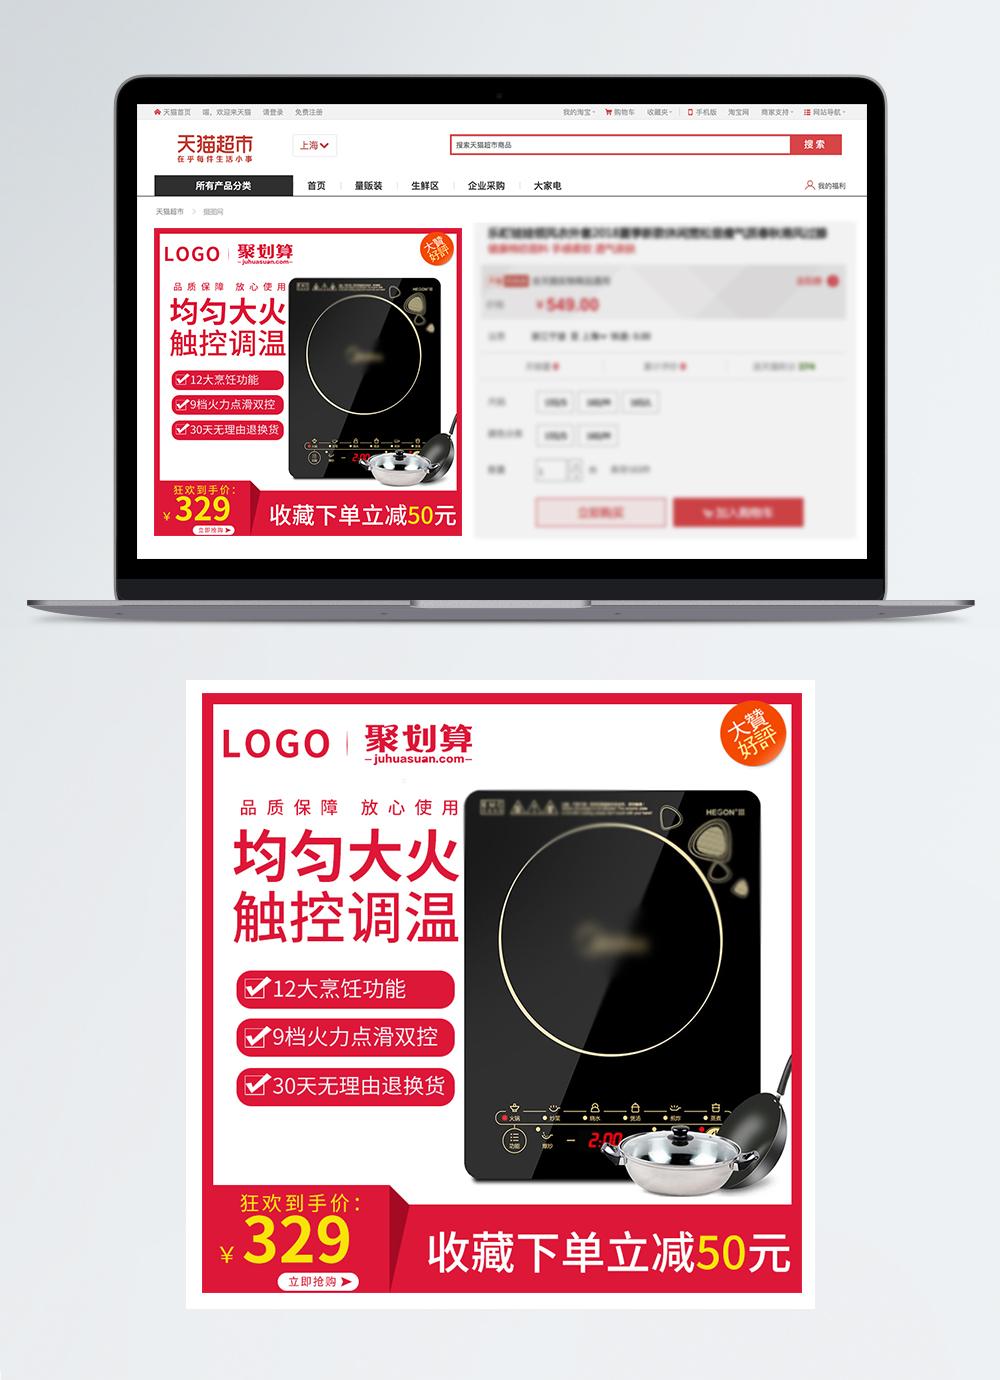 Induksi Kompor Taobao Peta Utama Melalui Kereta Api Gambar Unduh